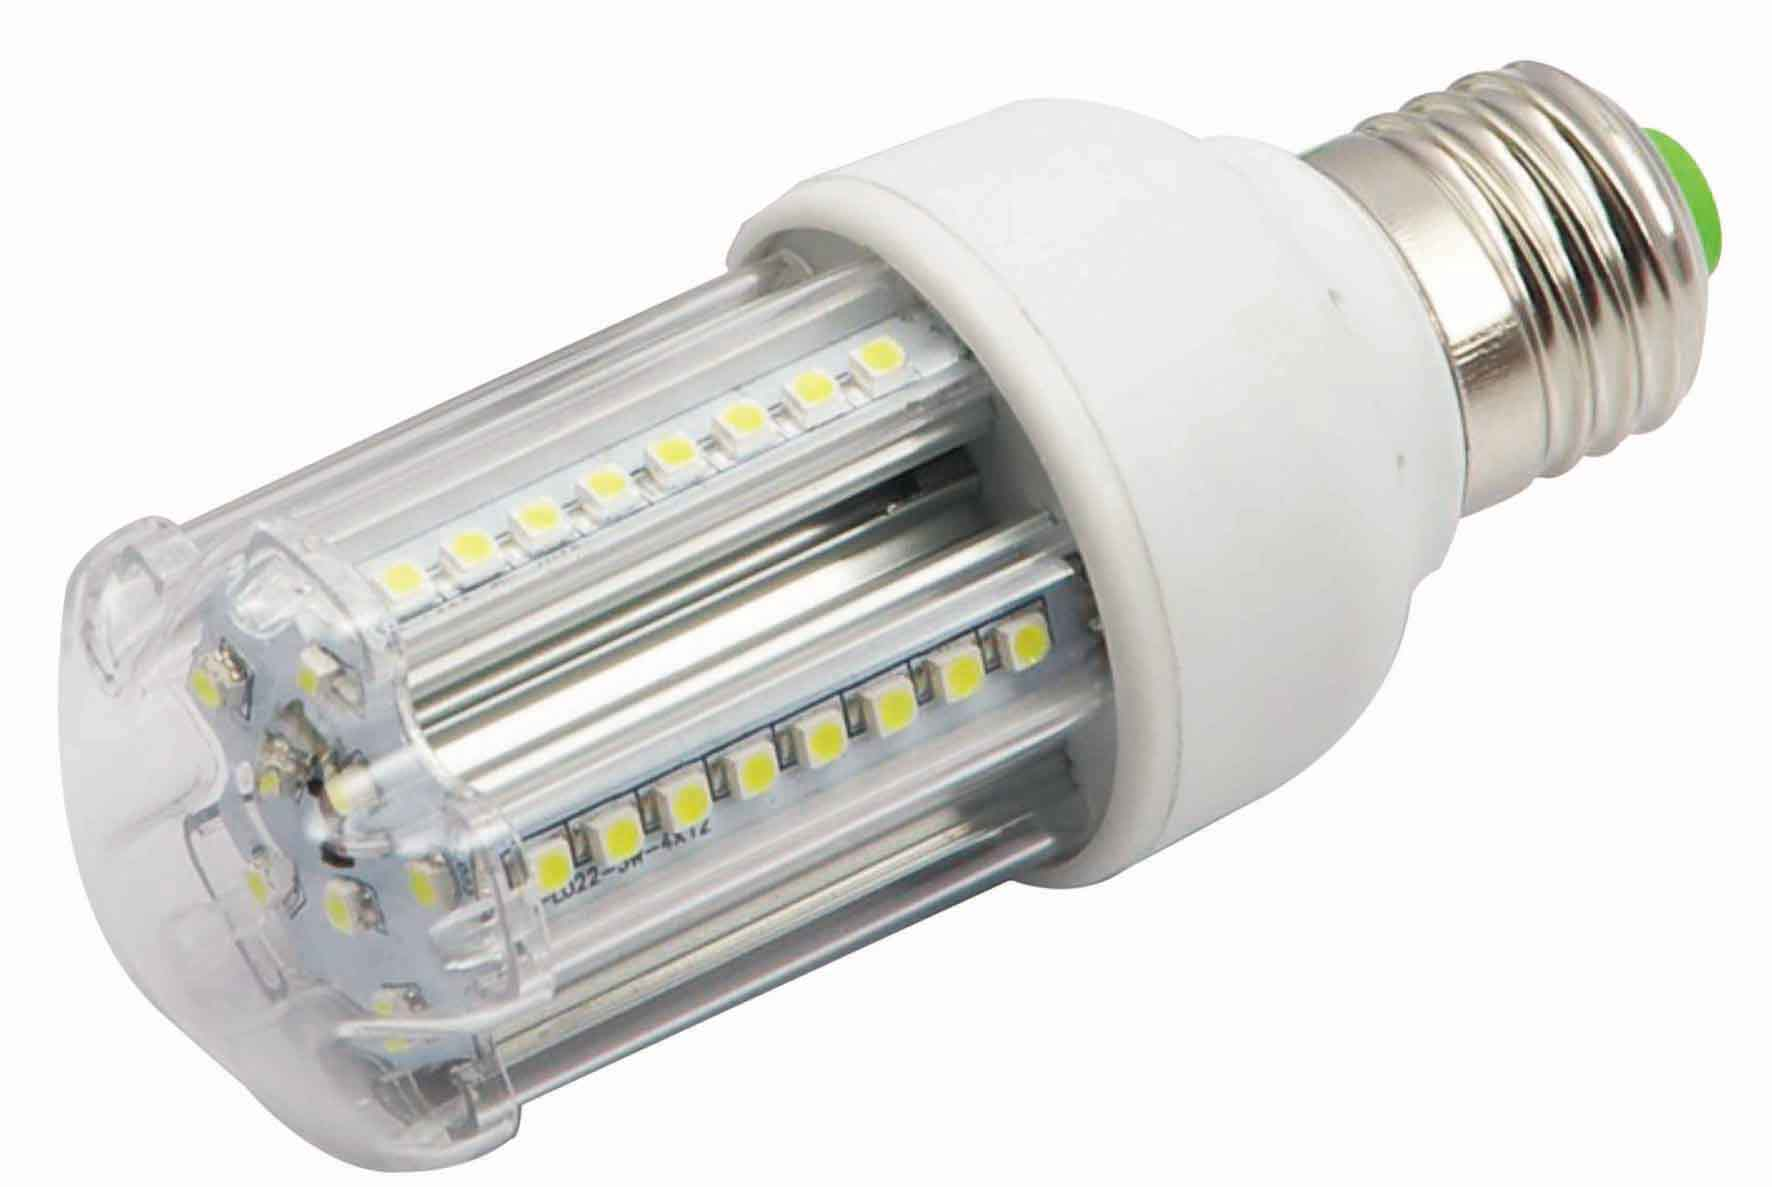 Led Lampen: Hornbach Led Lampen